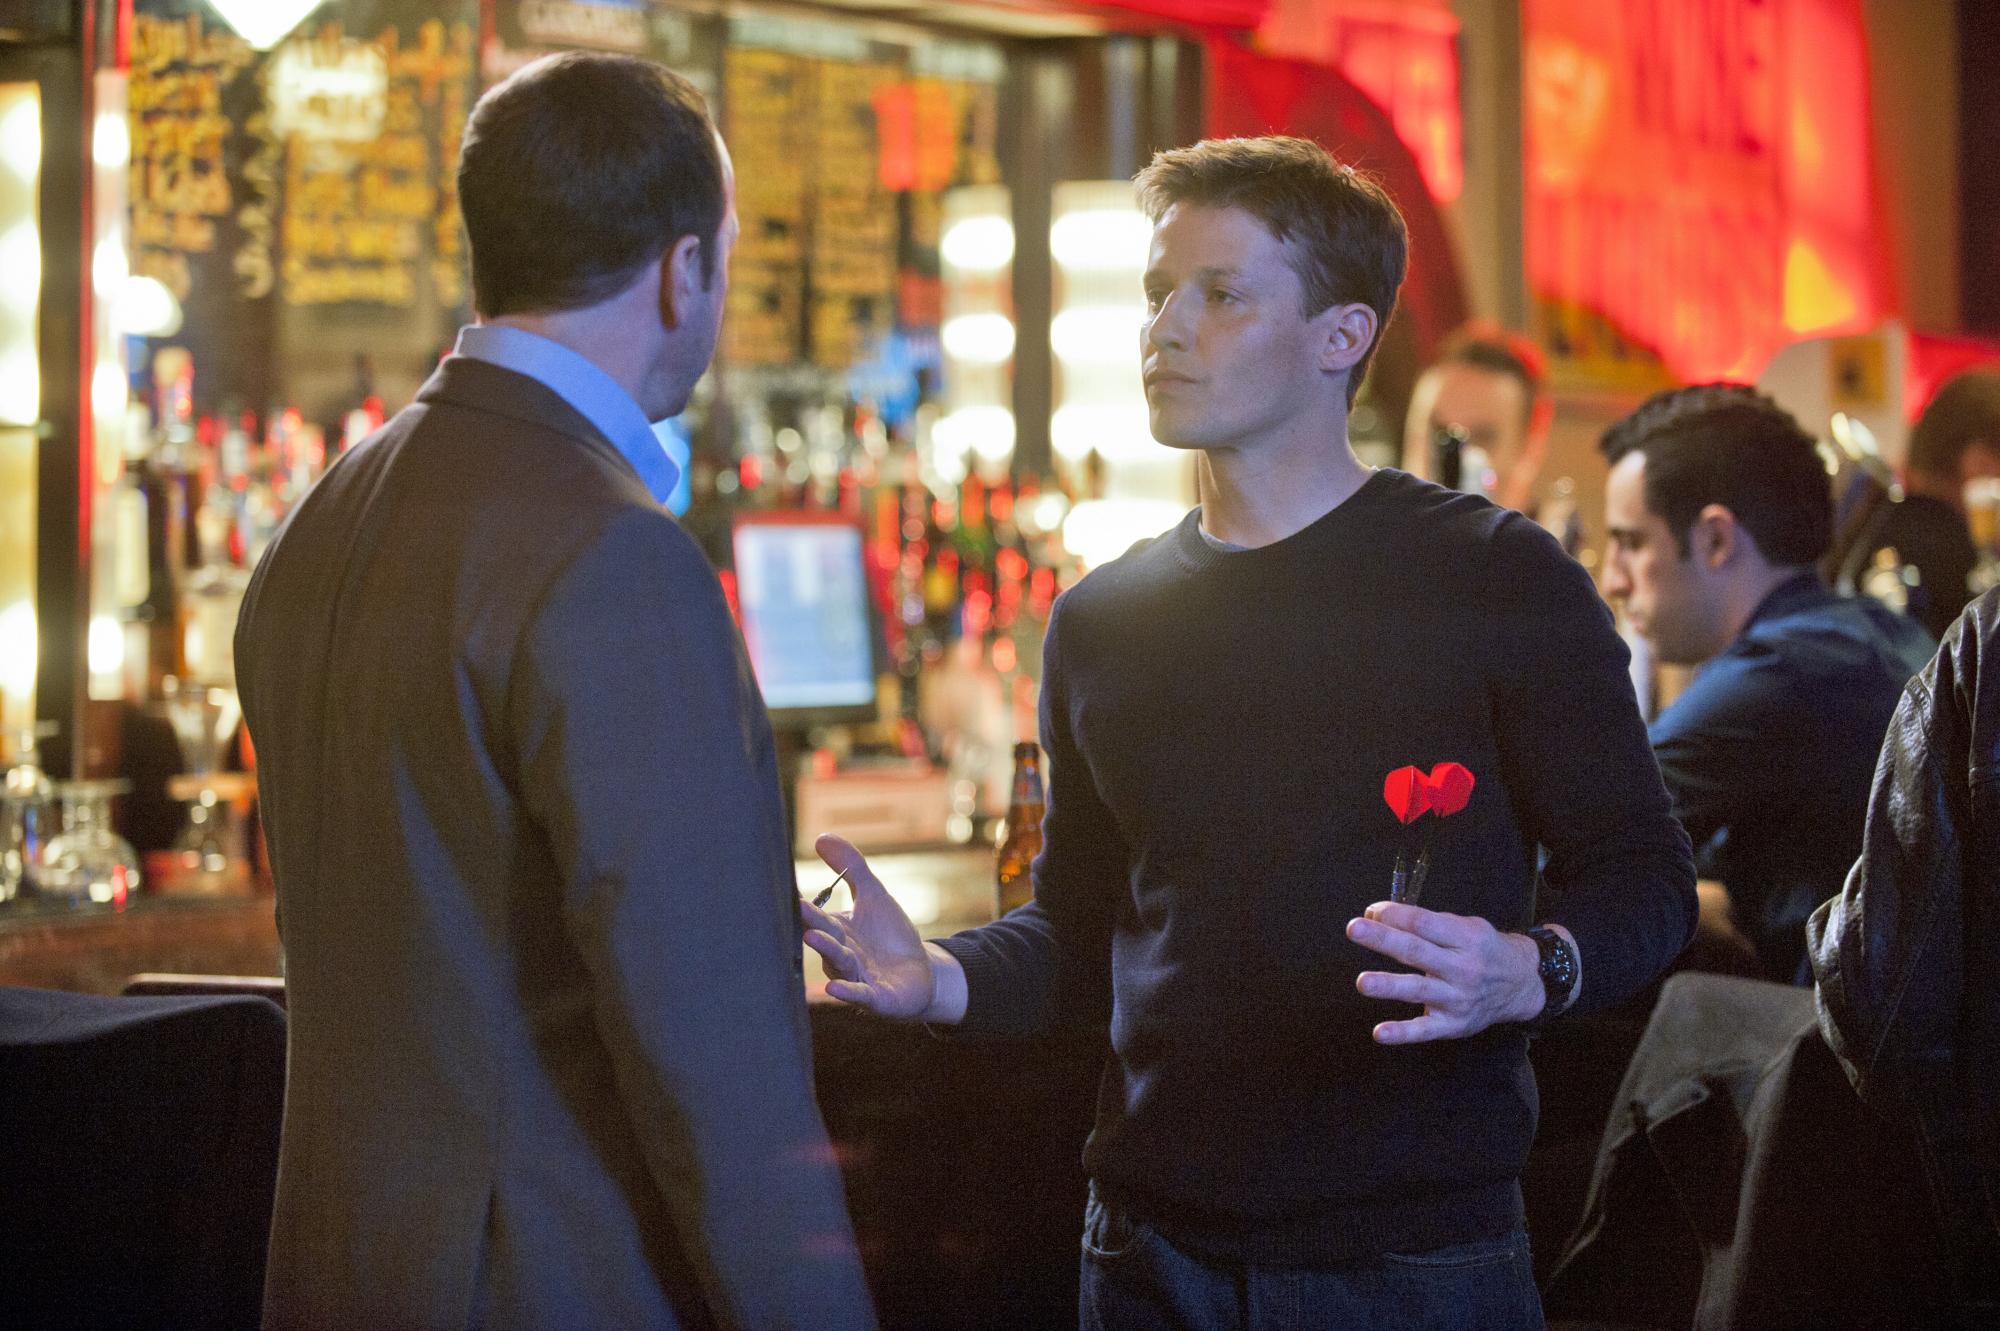 Jamie Talks with Danny